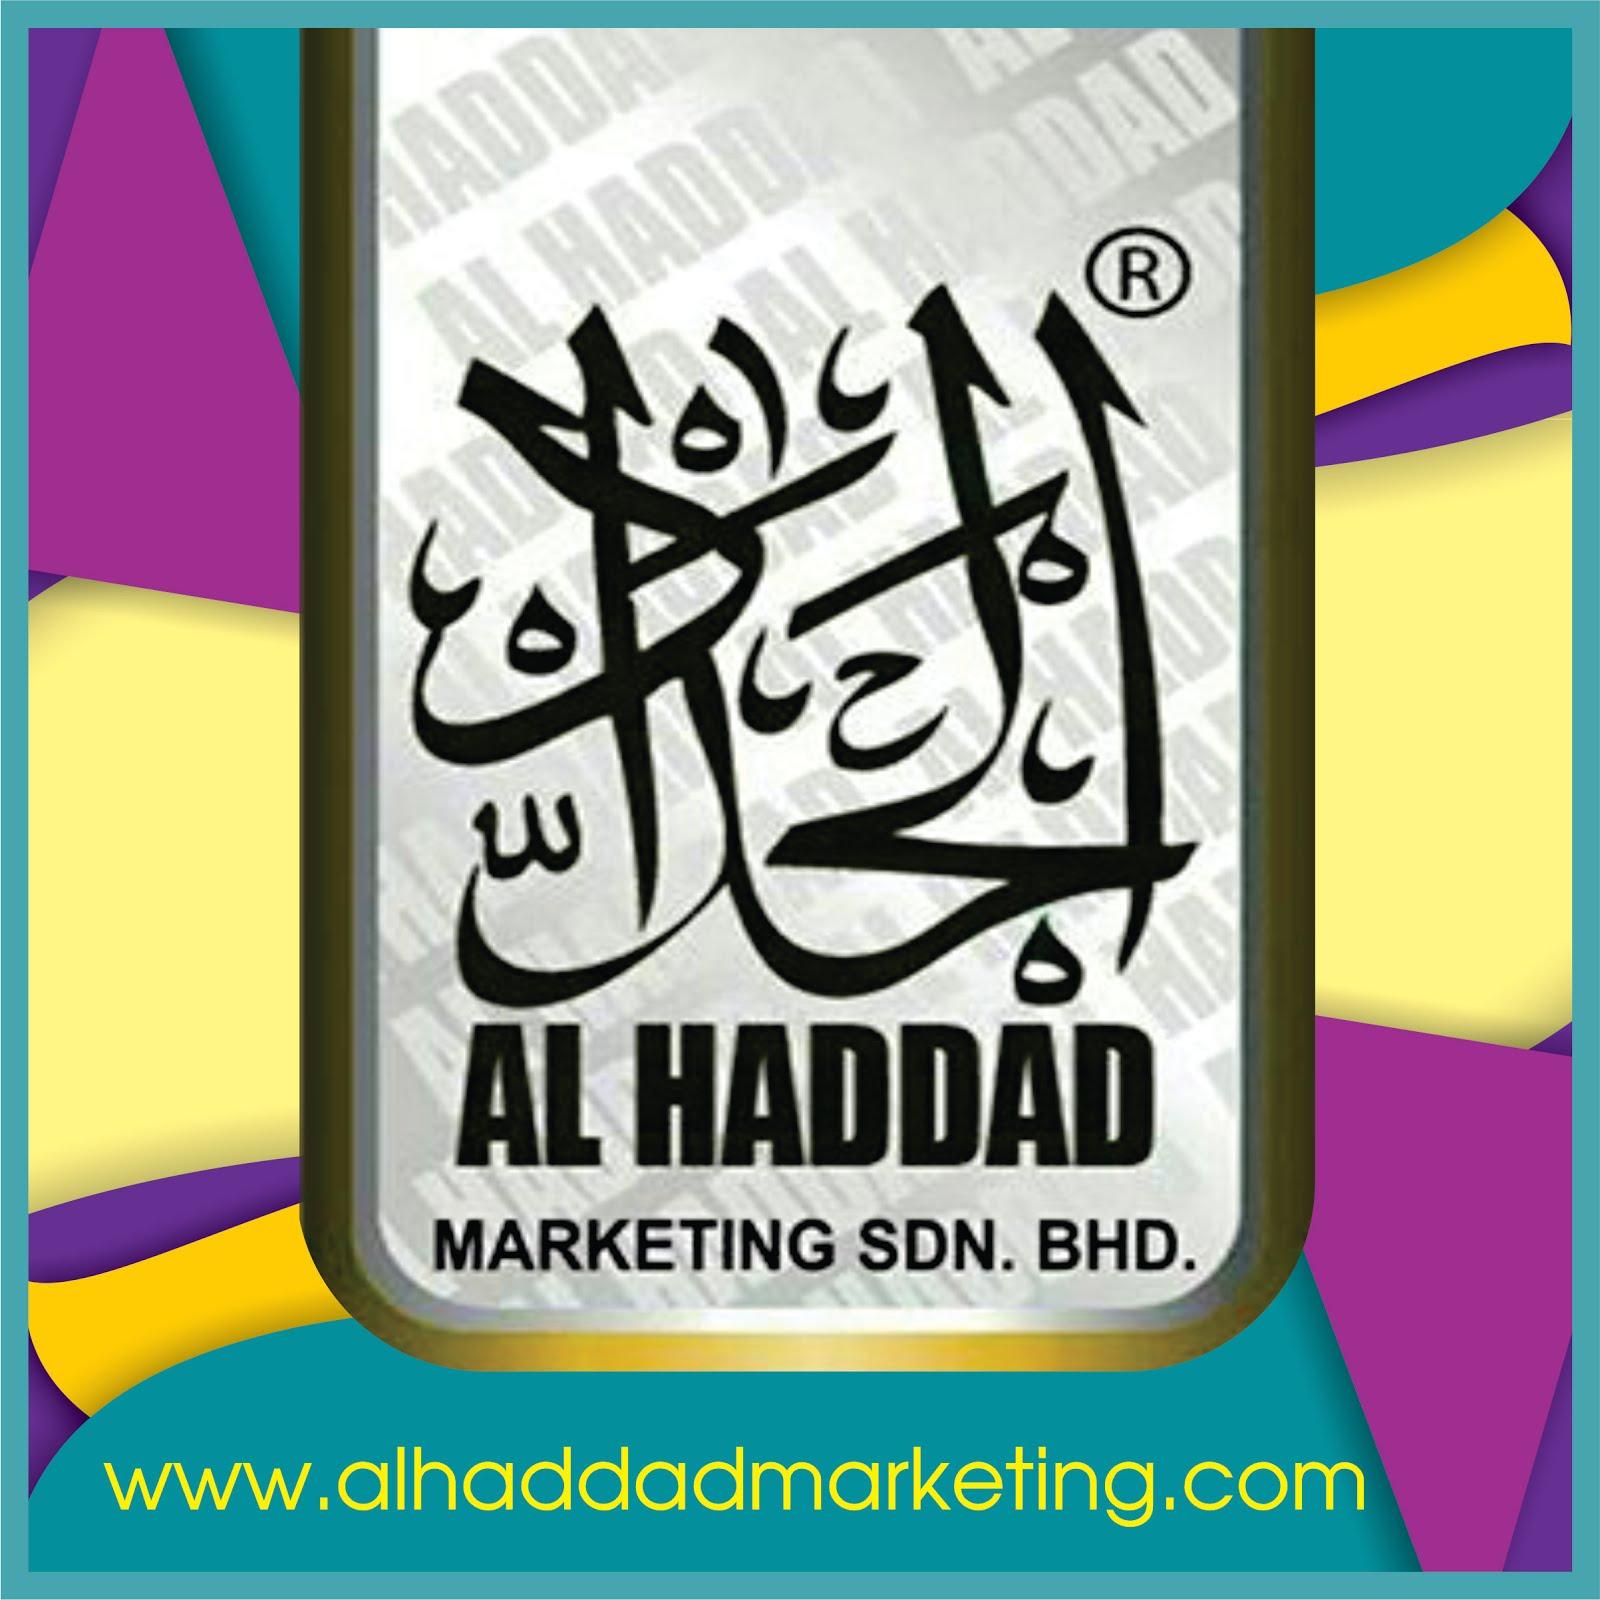 Al Haddad Marketing